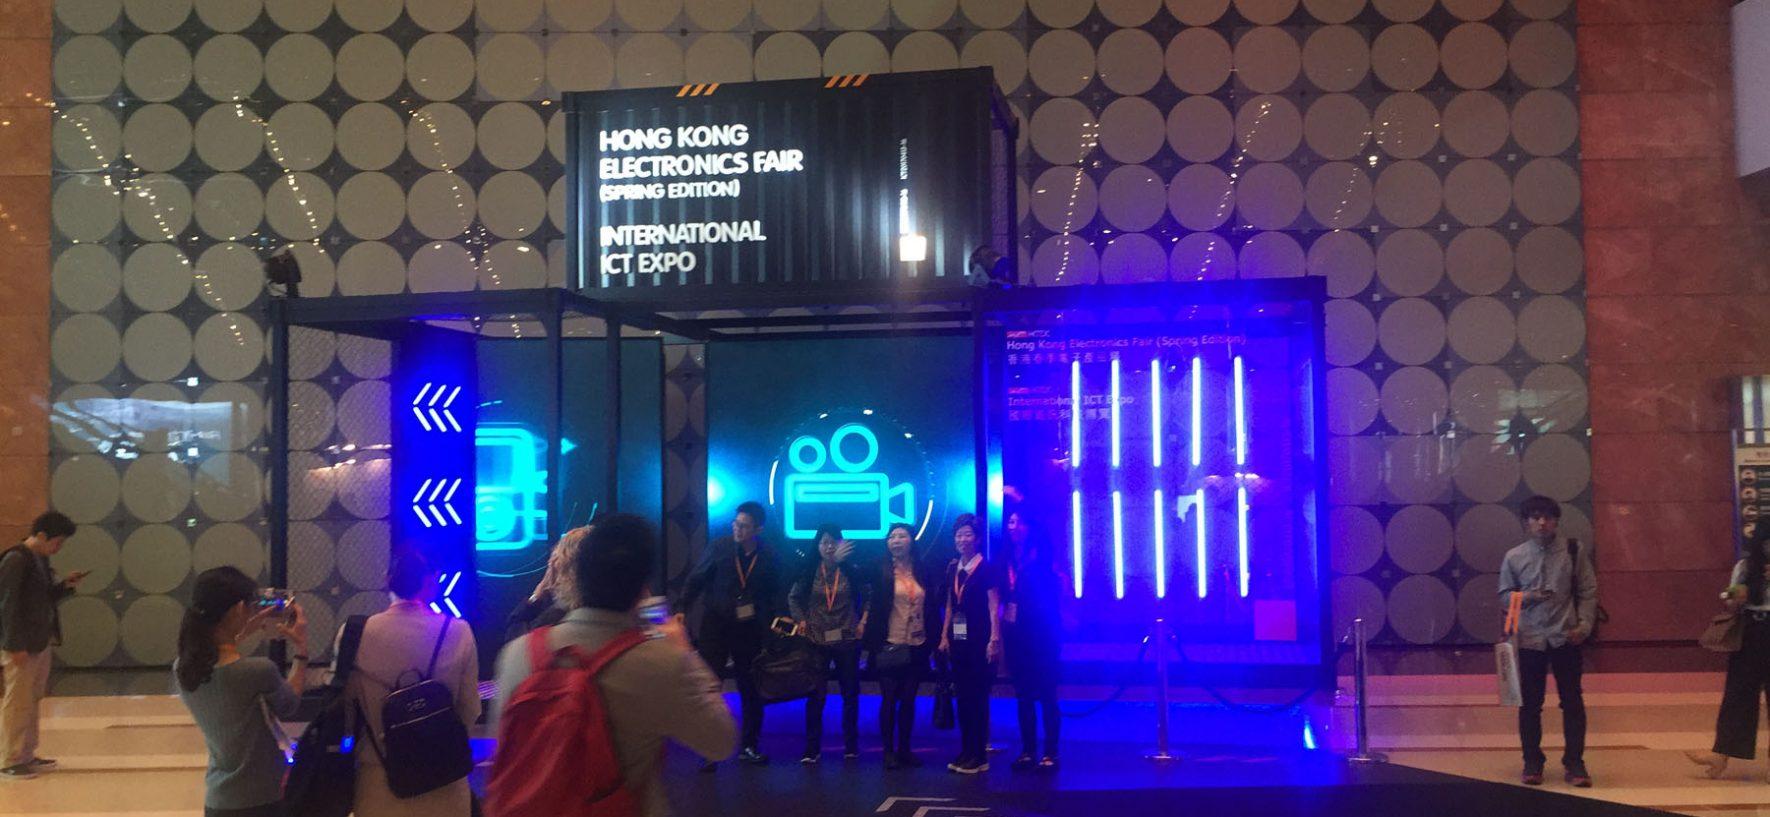 Hong Kong Electronics Fair Spring Edition 2017